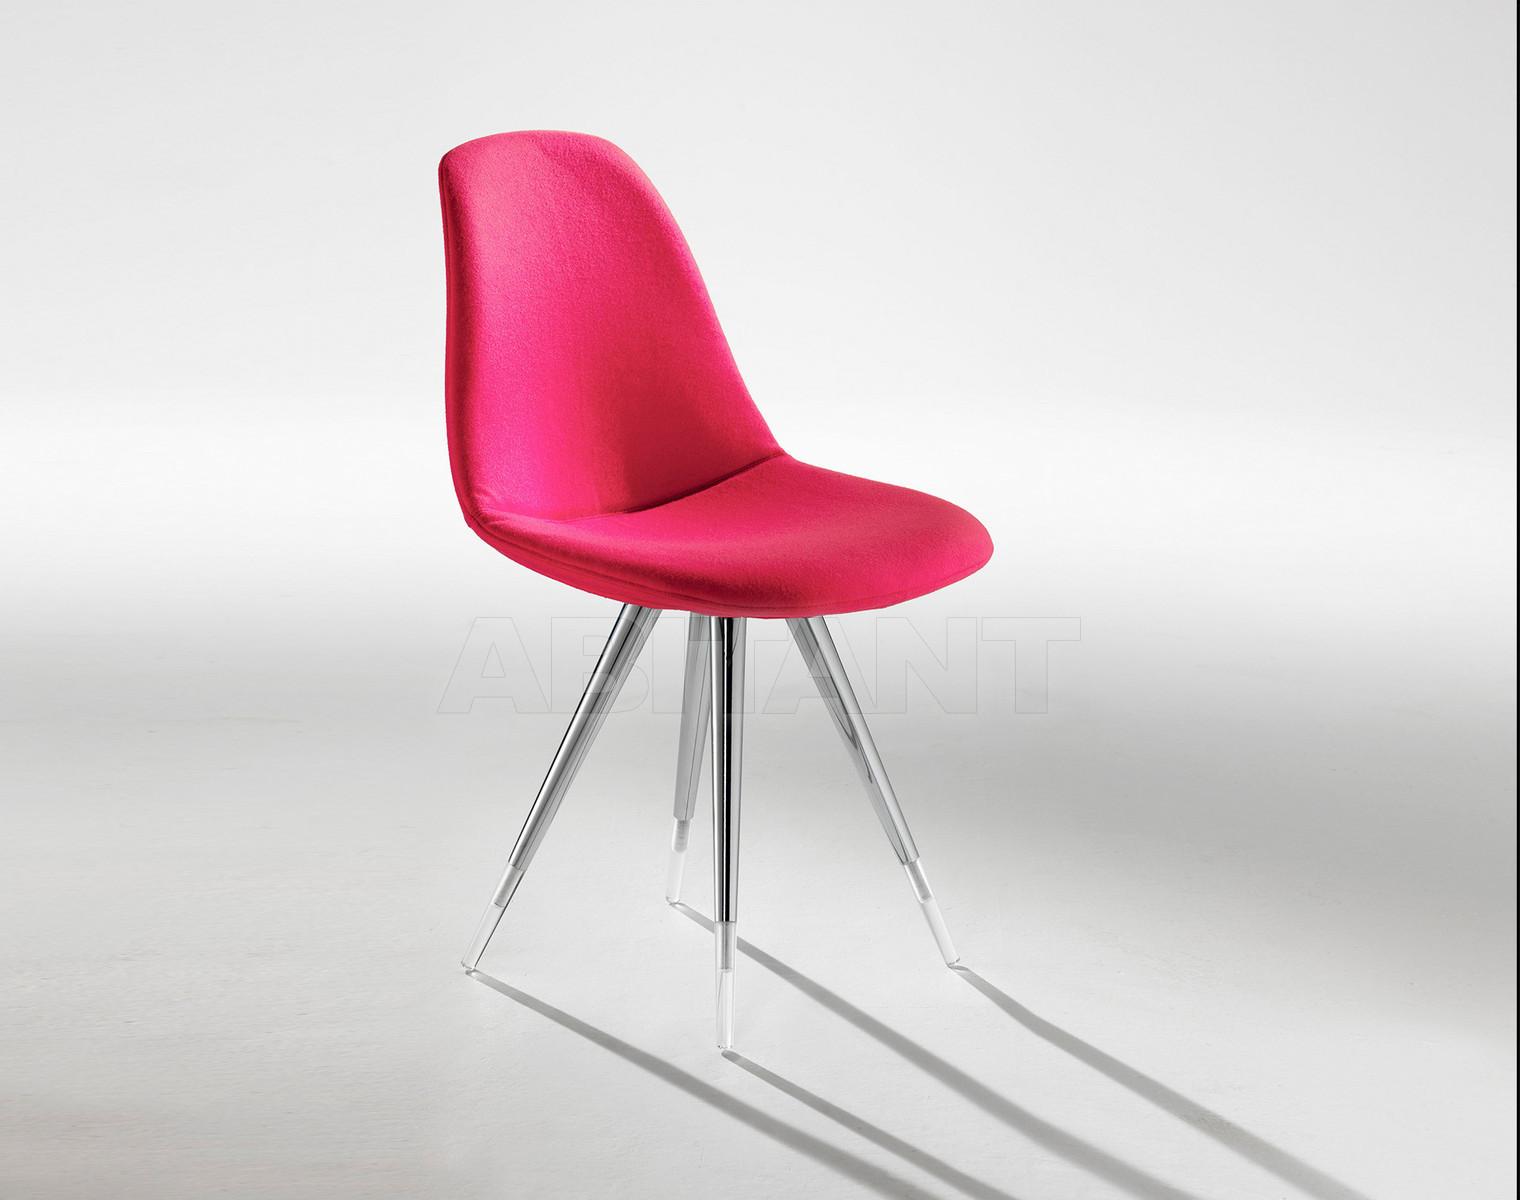 Купить Стул Kubikoff Gino Lemson & Ruud Bos Angel'POP'Chair' 18